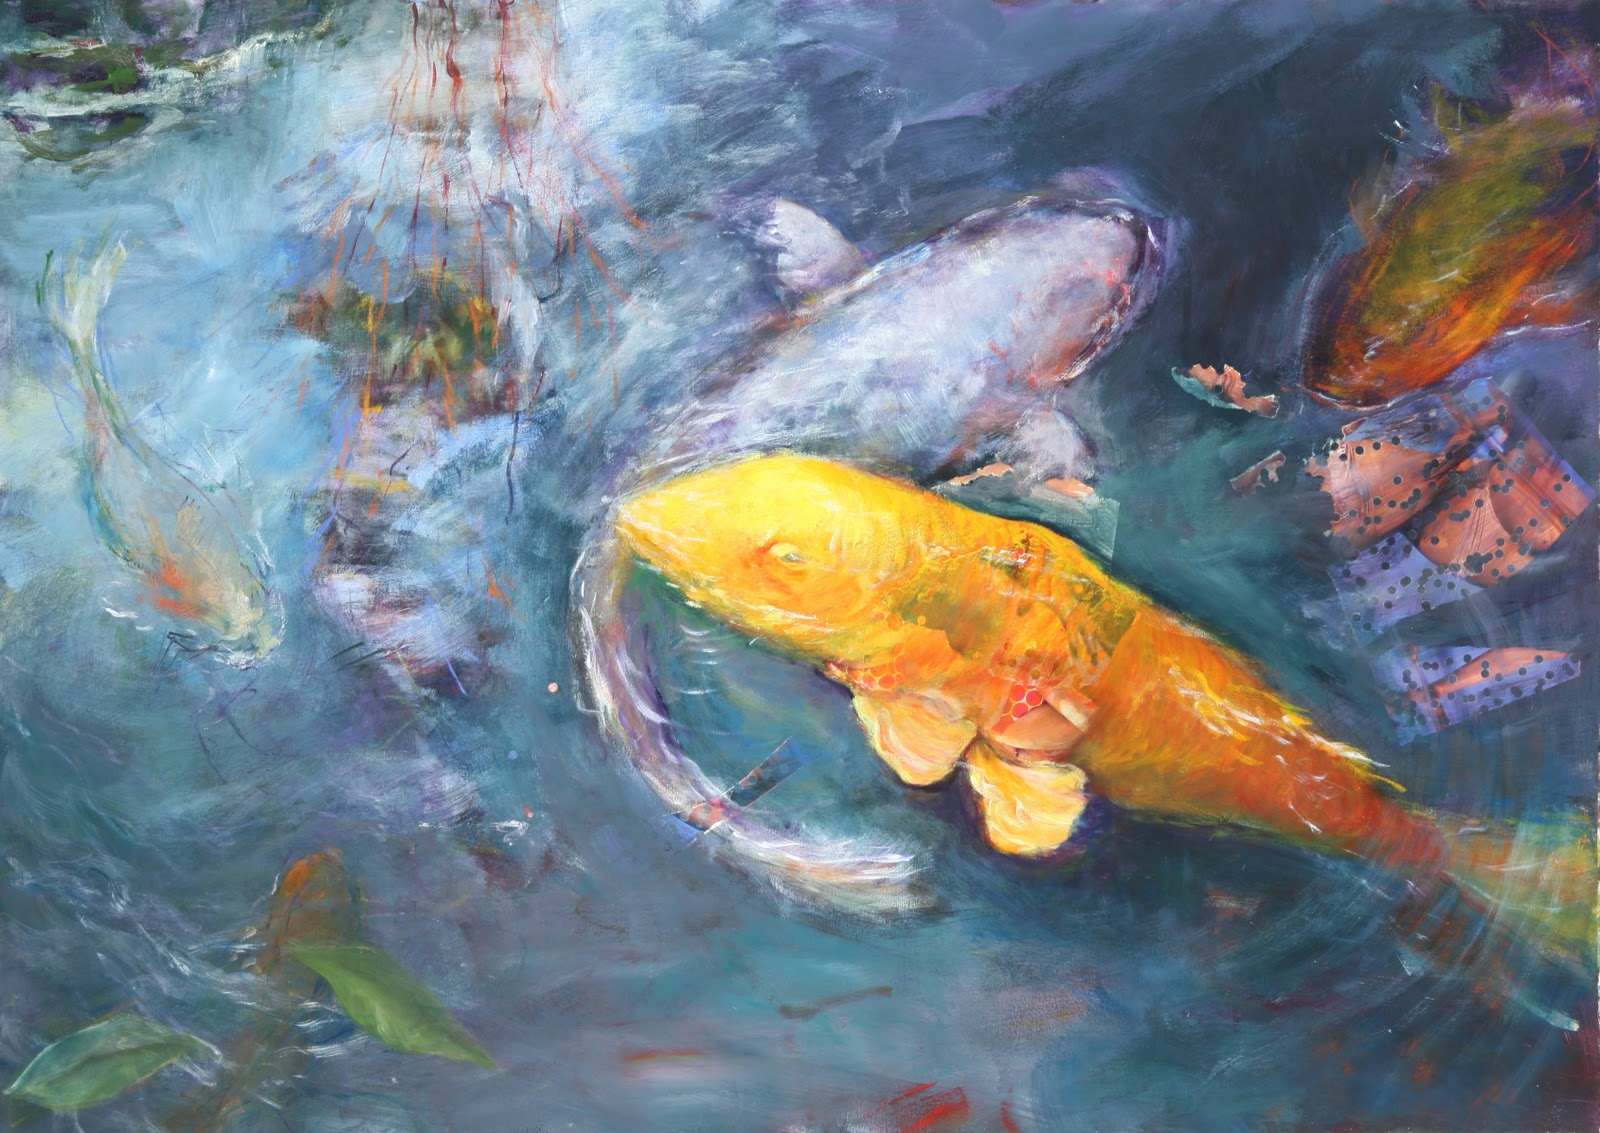 Nanci hersh artist big fish little pond for Big fish pond